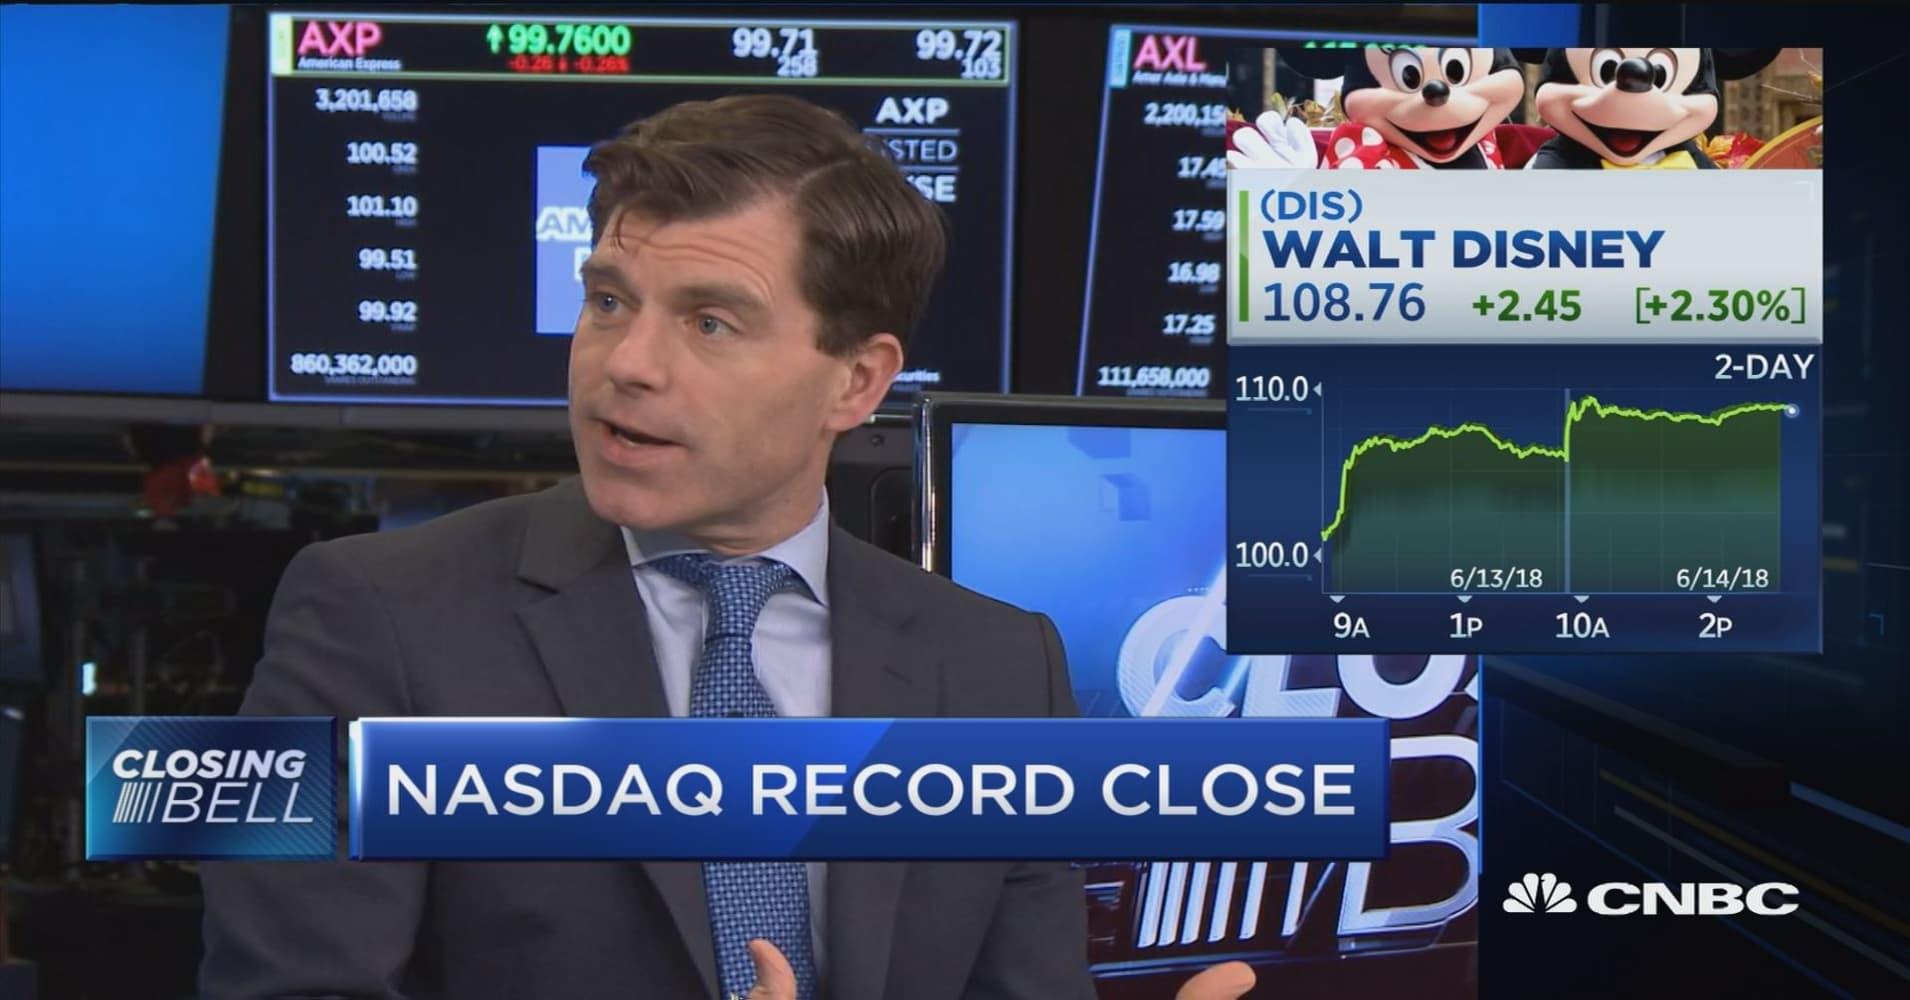 Media, retail, and consumer discretionary stocks lead the market on  Thursday, June 14